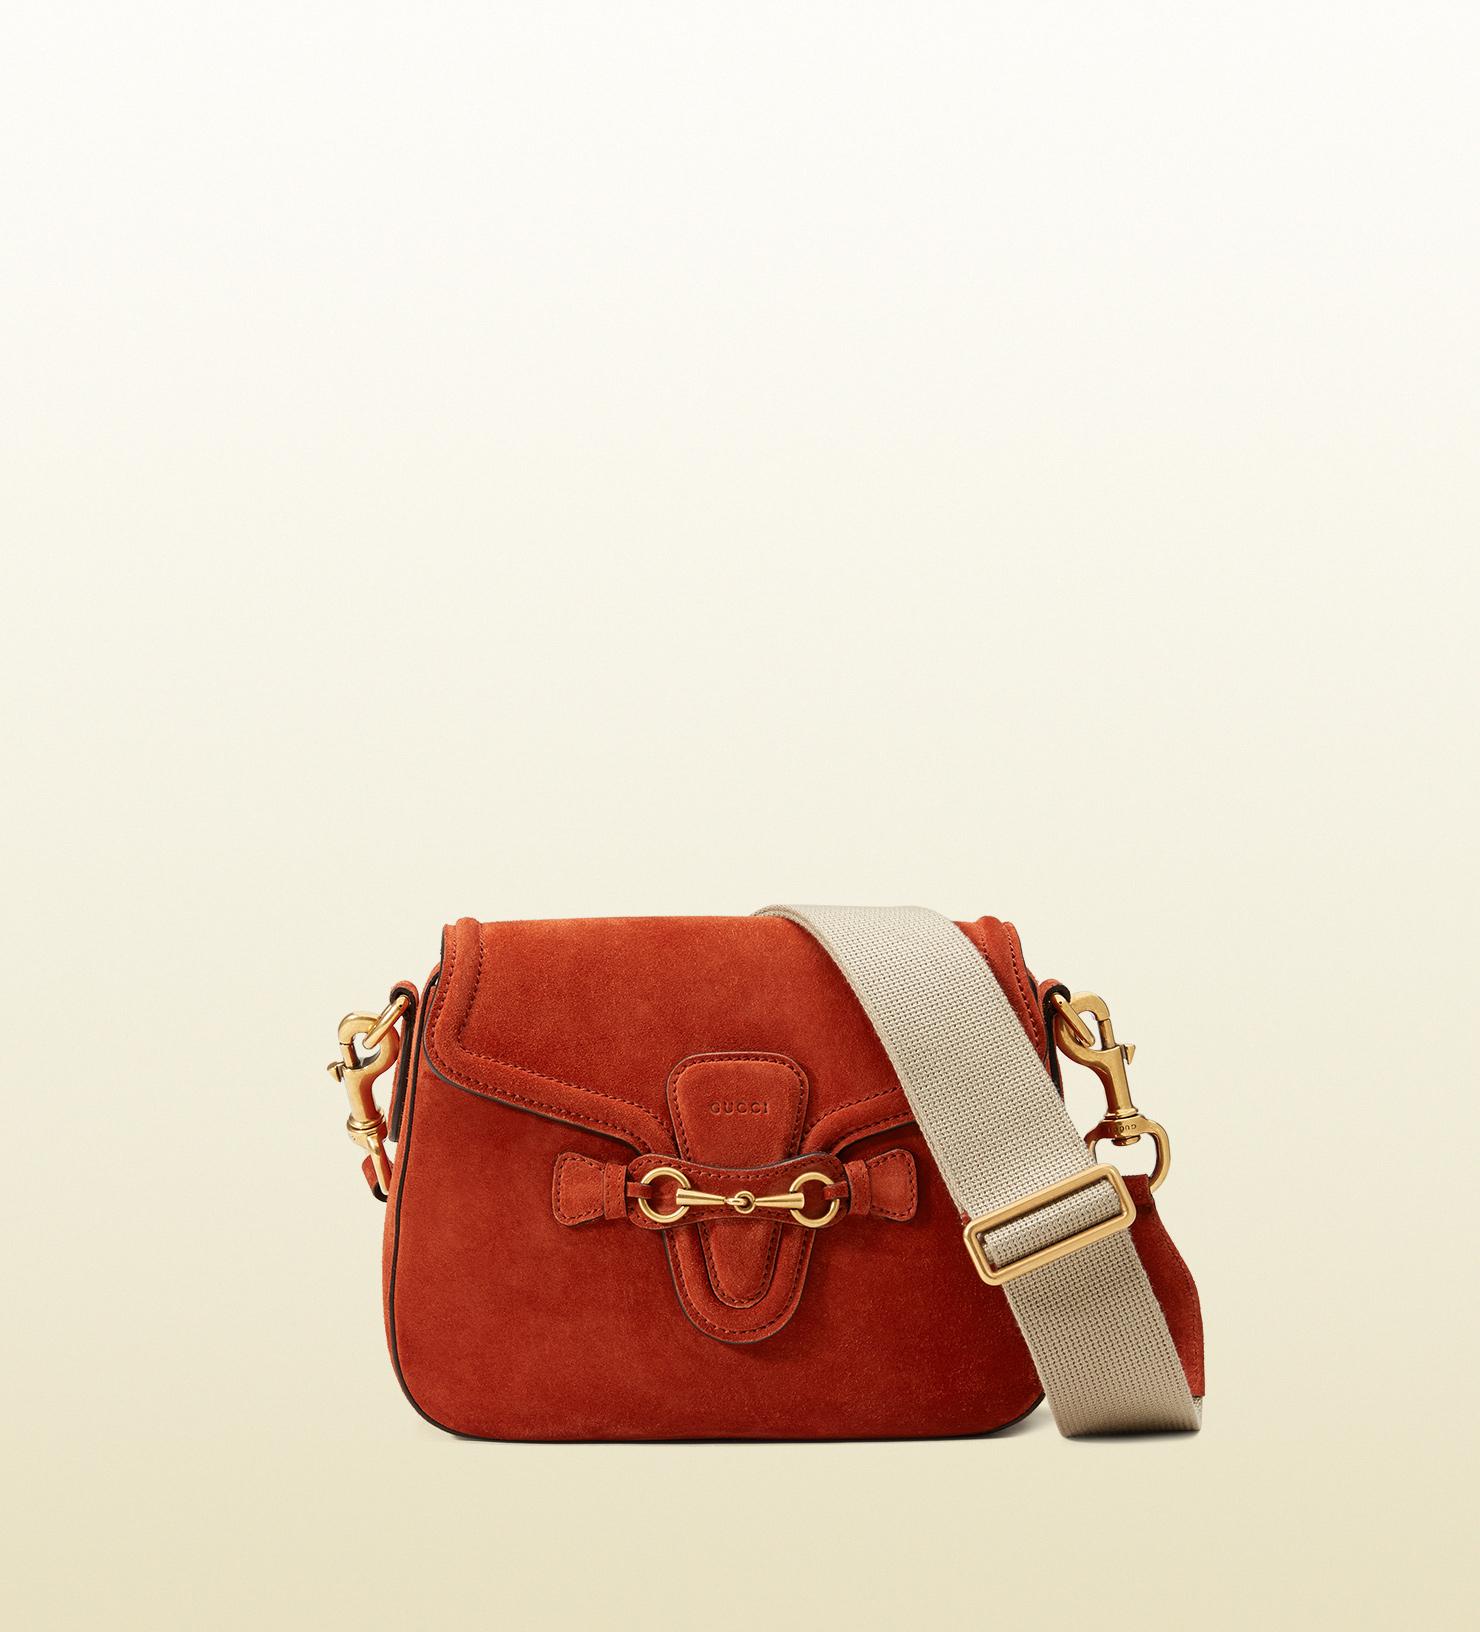 8e09de6cf15 Lyst - Gucci Lady Web Suede Shoulder Bag in Red